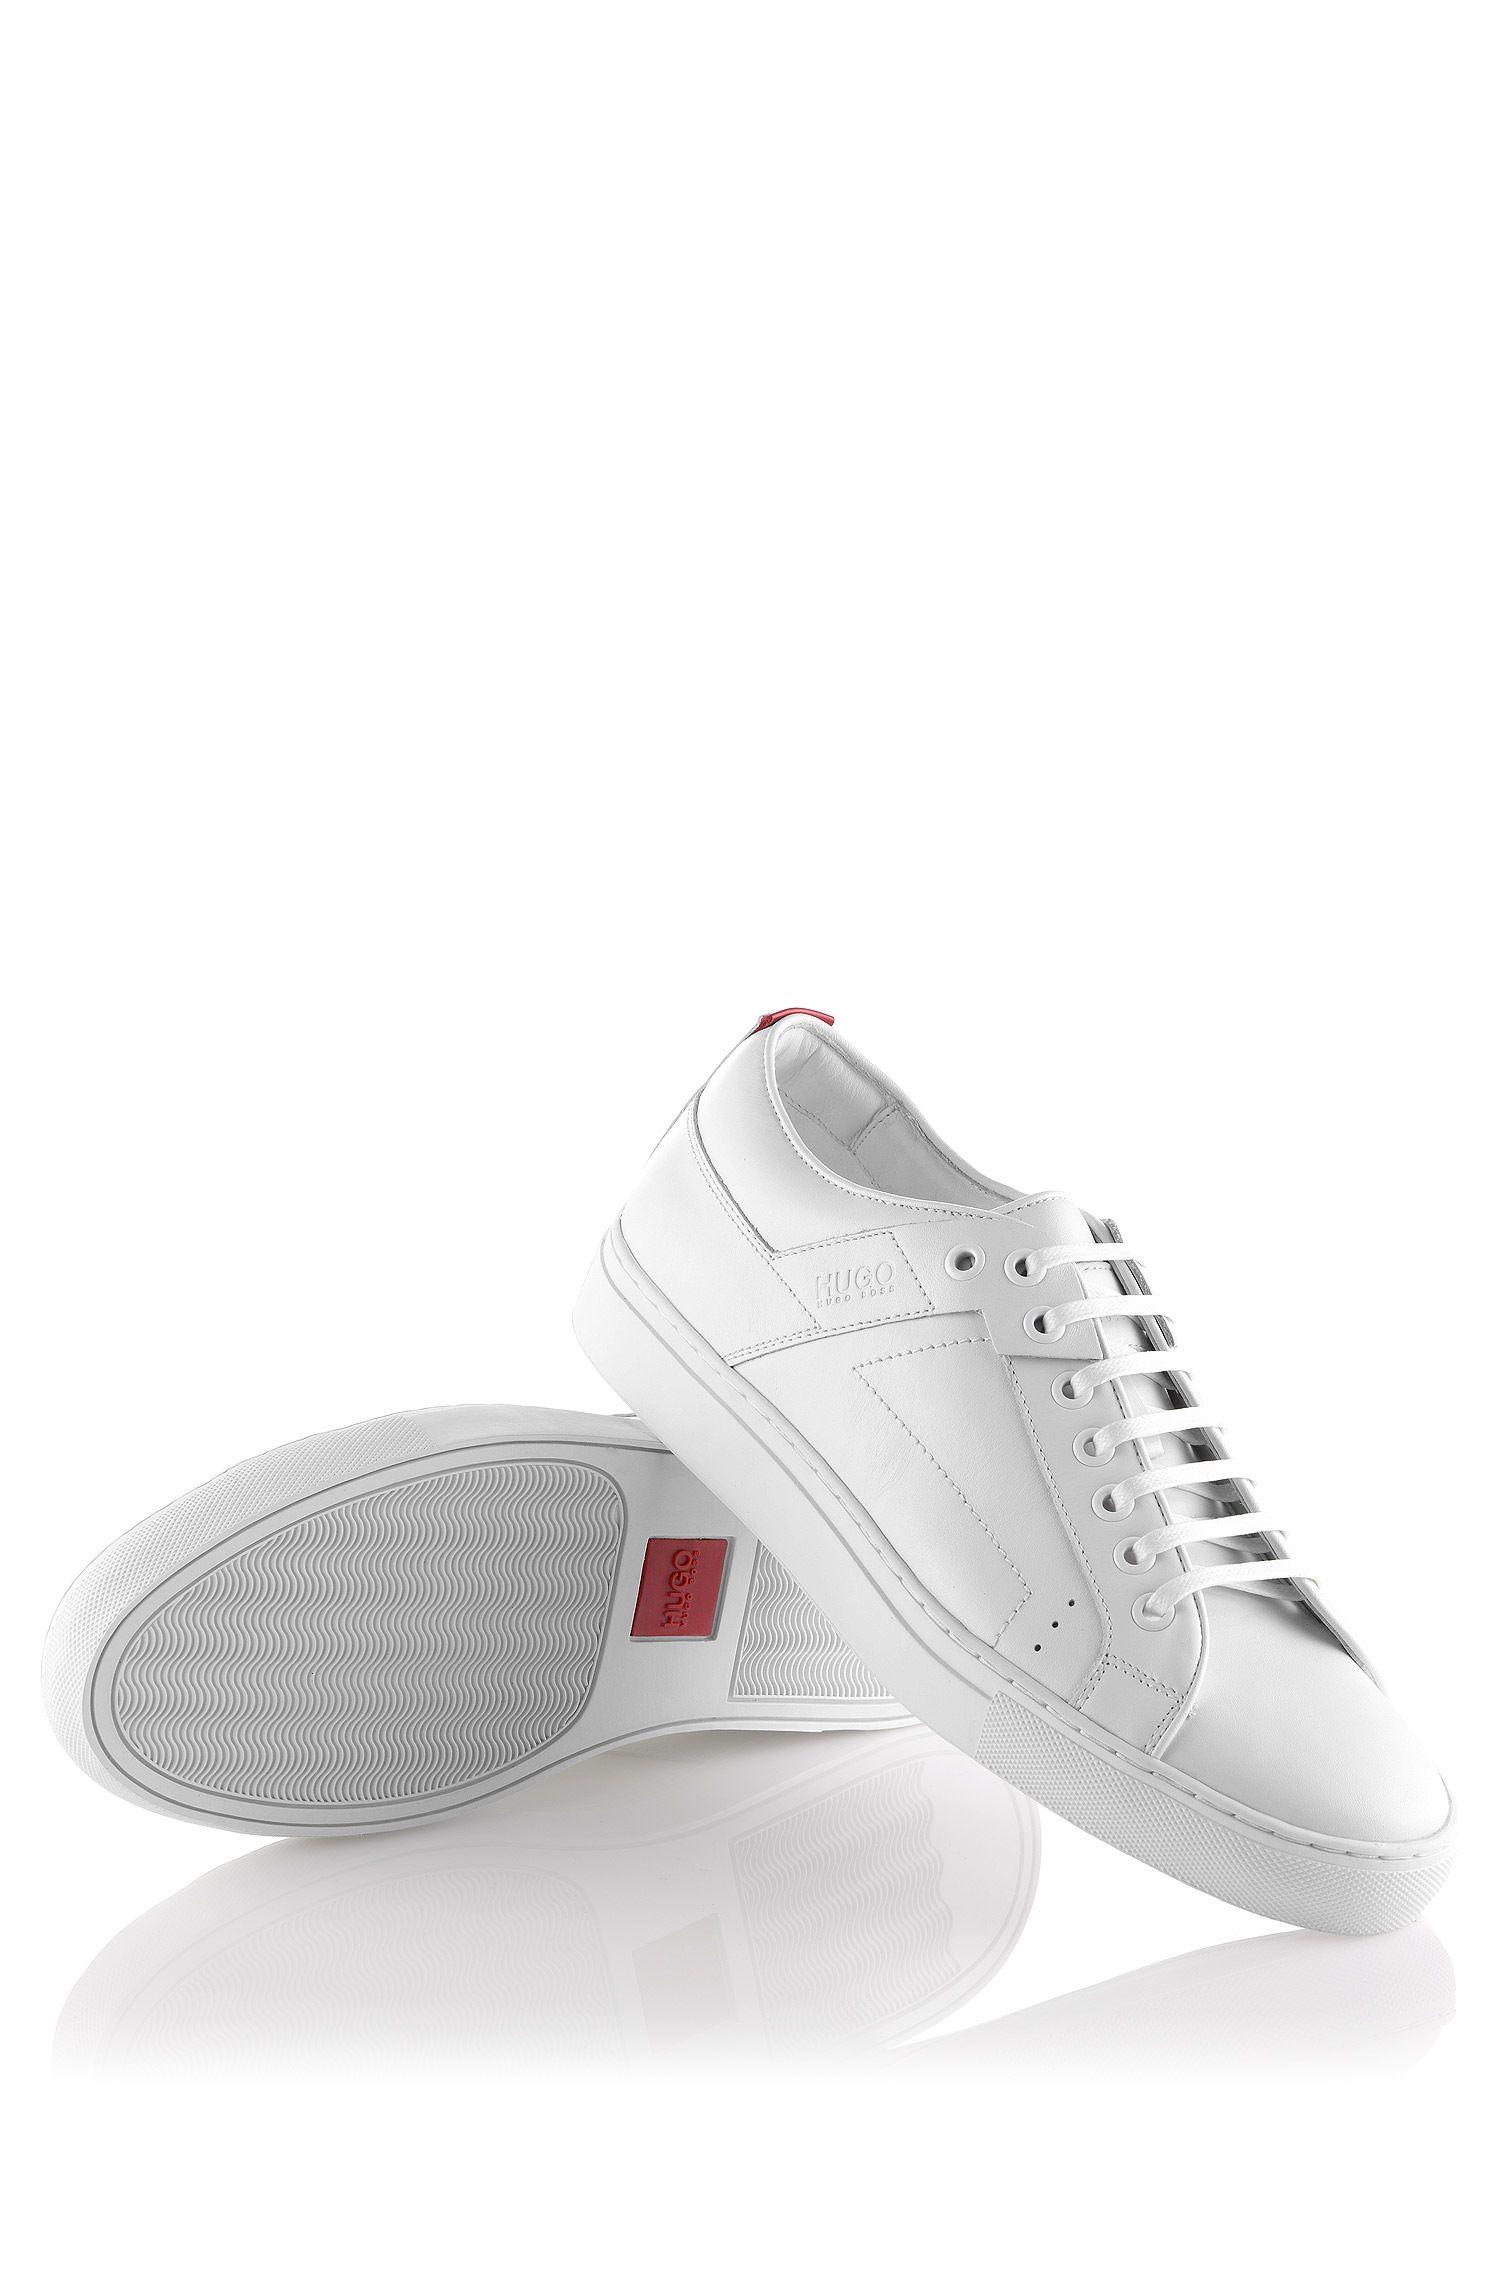 Hugo Sneaker Futesio Aus Leder Versandkostenfrei Bestellen Sneakers Men Fashion Sneakers Perfect Sneakers